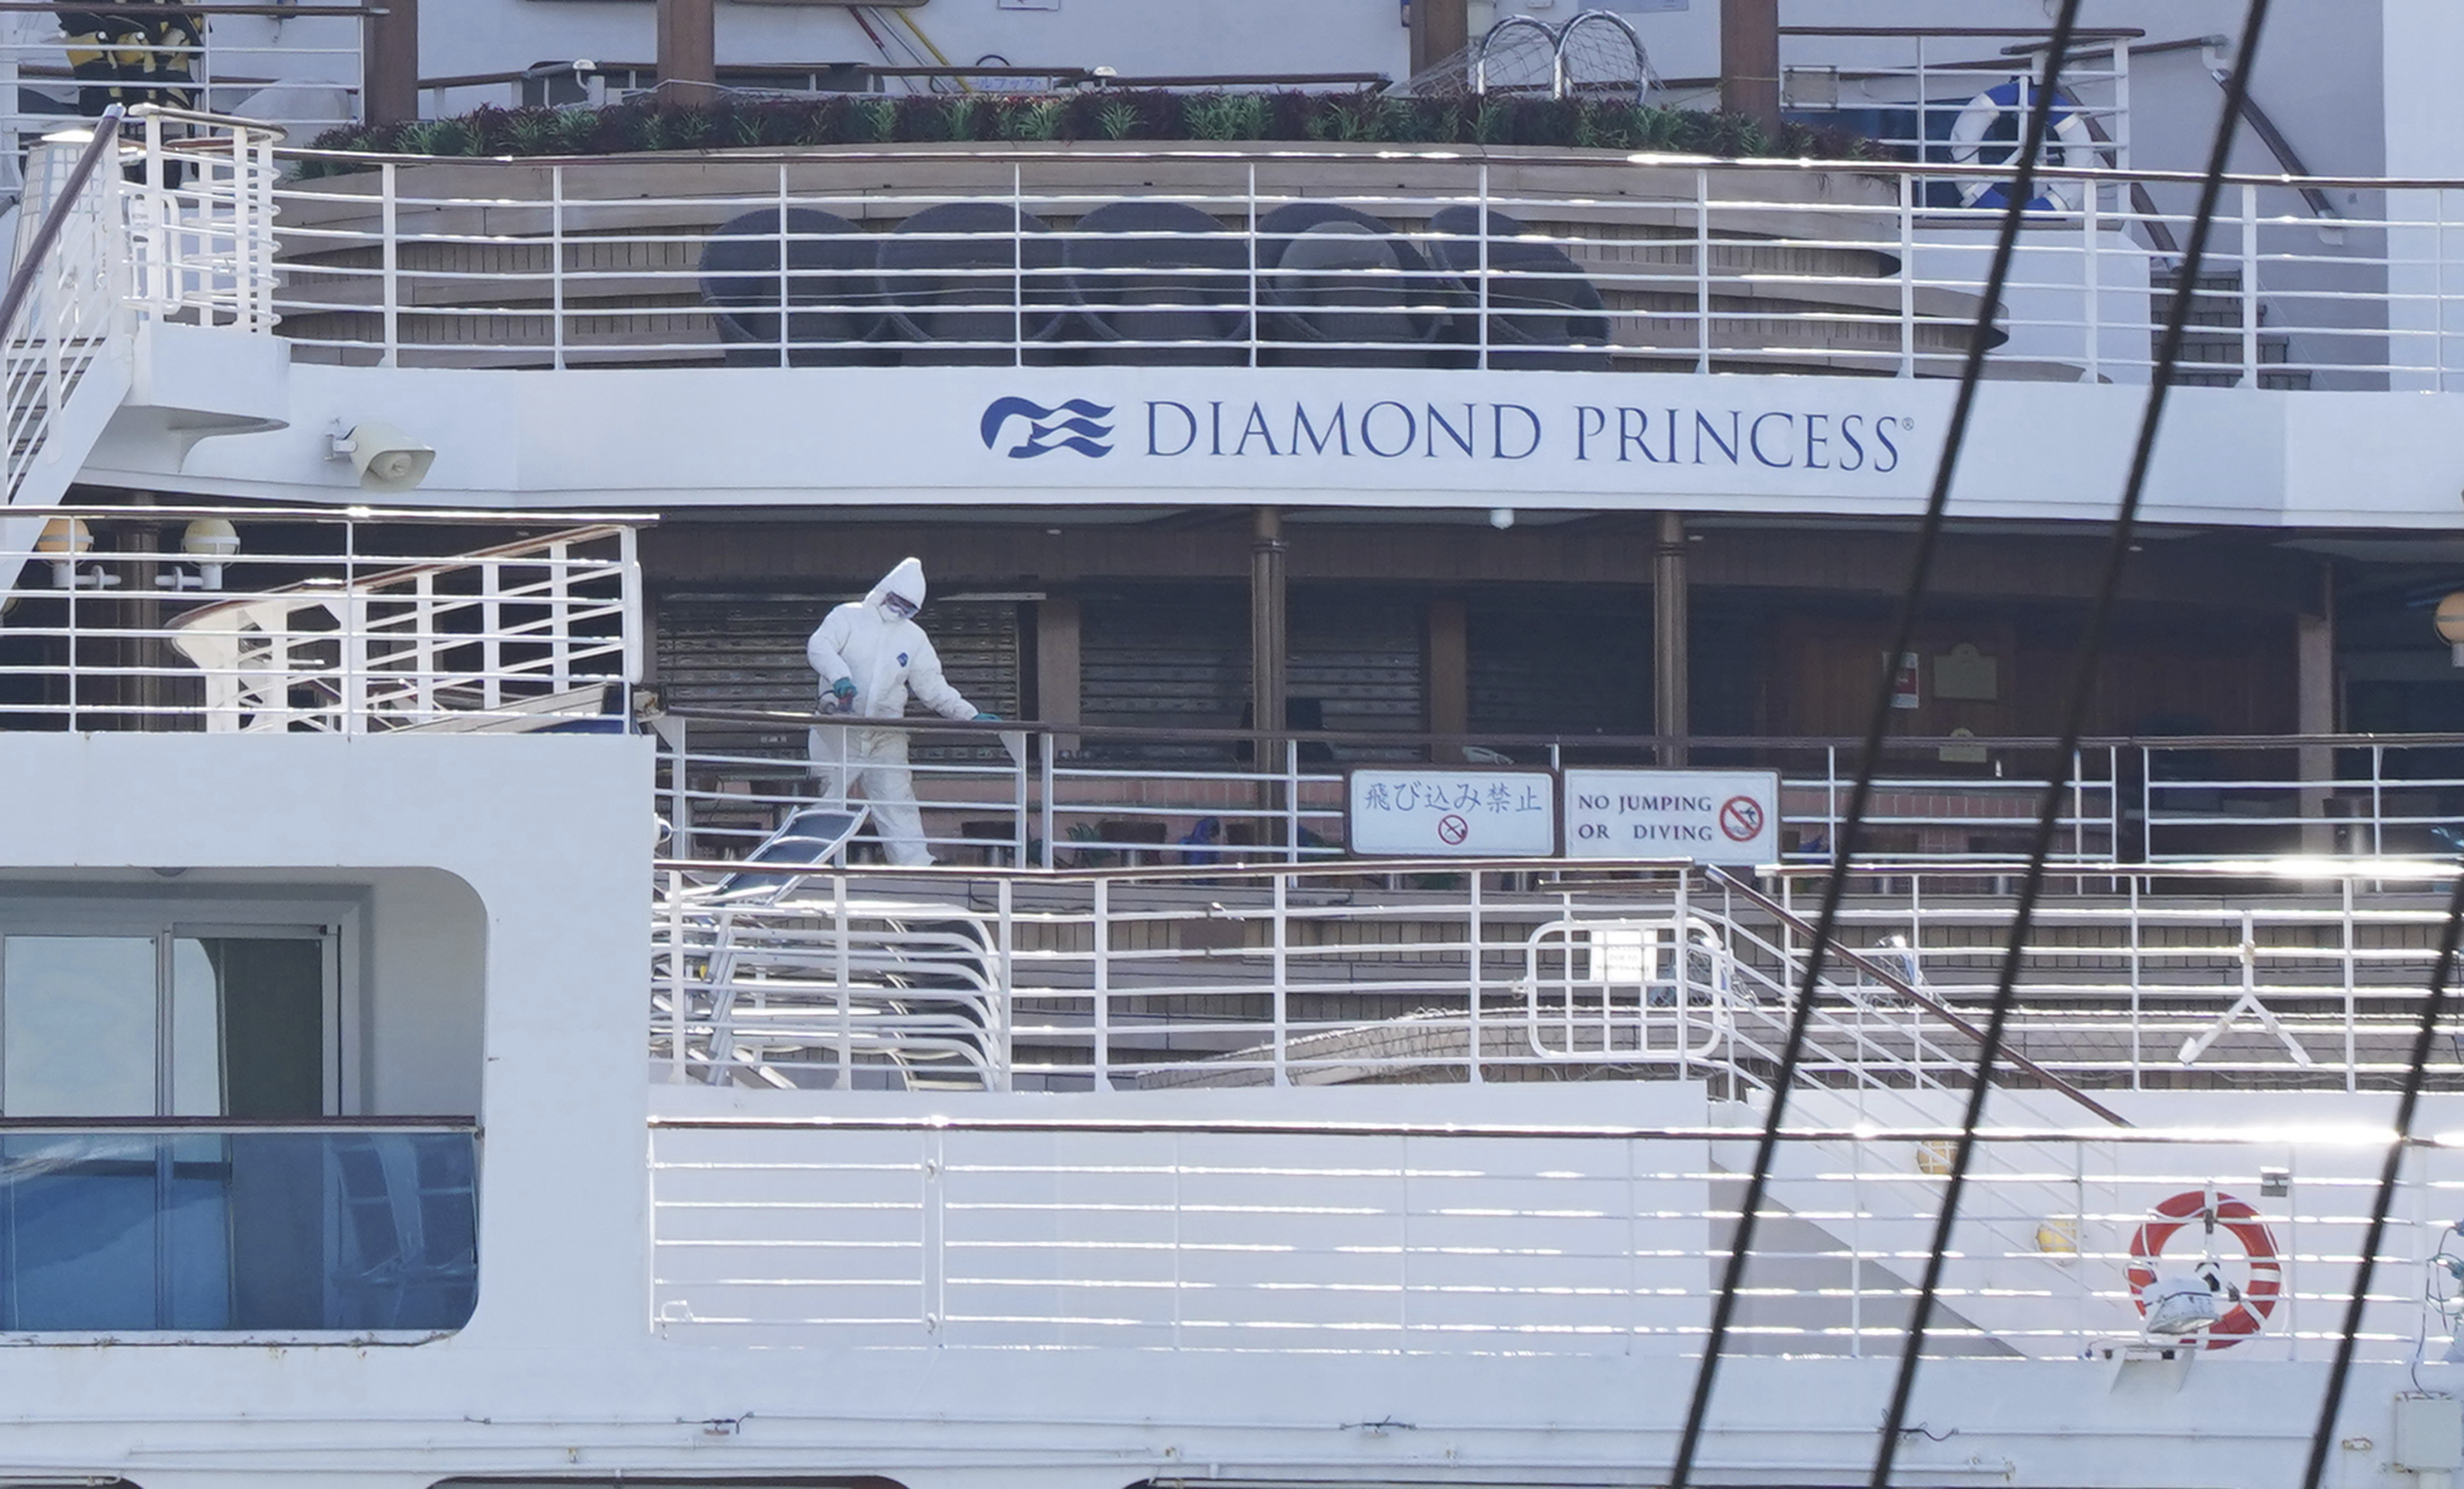 A health worker is seen on the Diamond Princess docked at Daikoku Wharf in Yokohama, Japan, on Feb. 19, 2020.